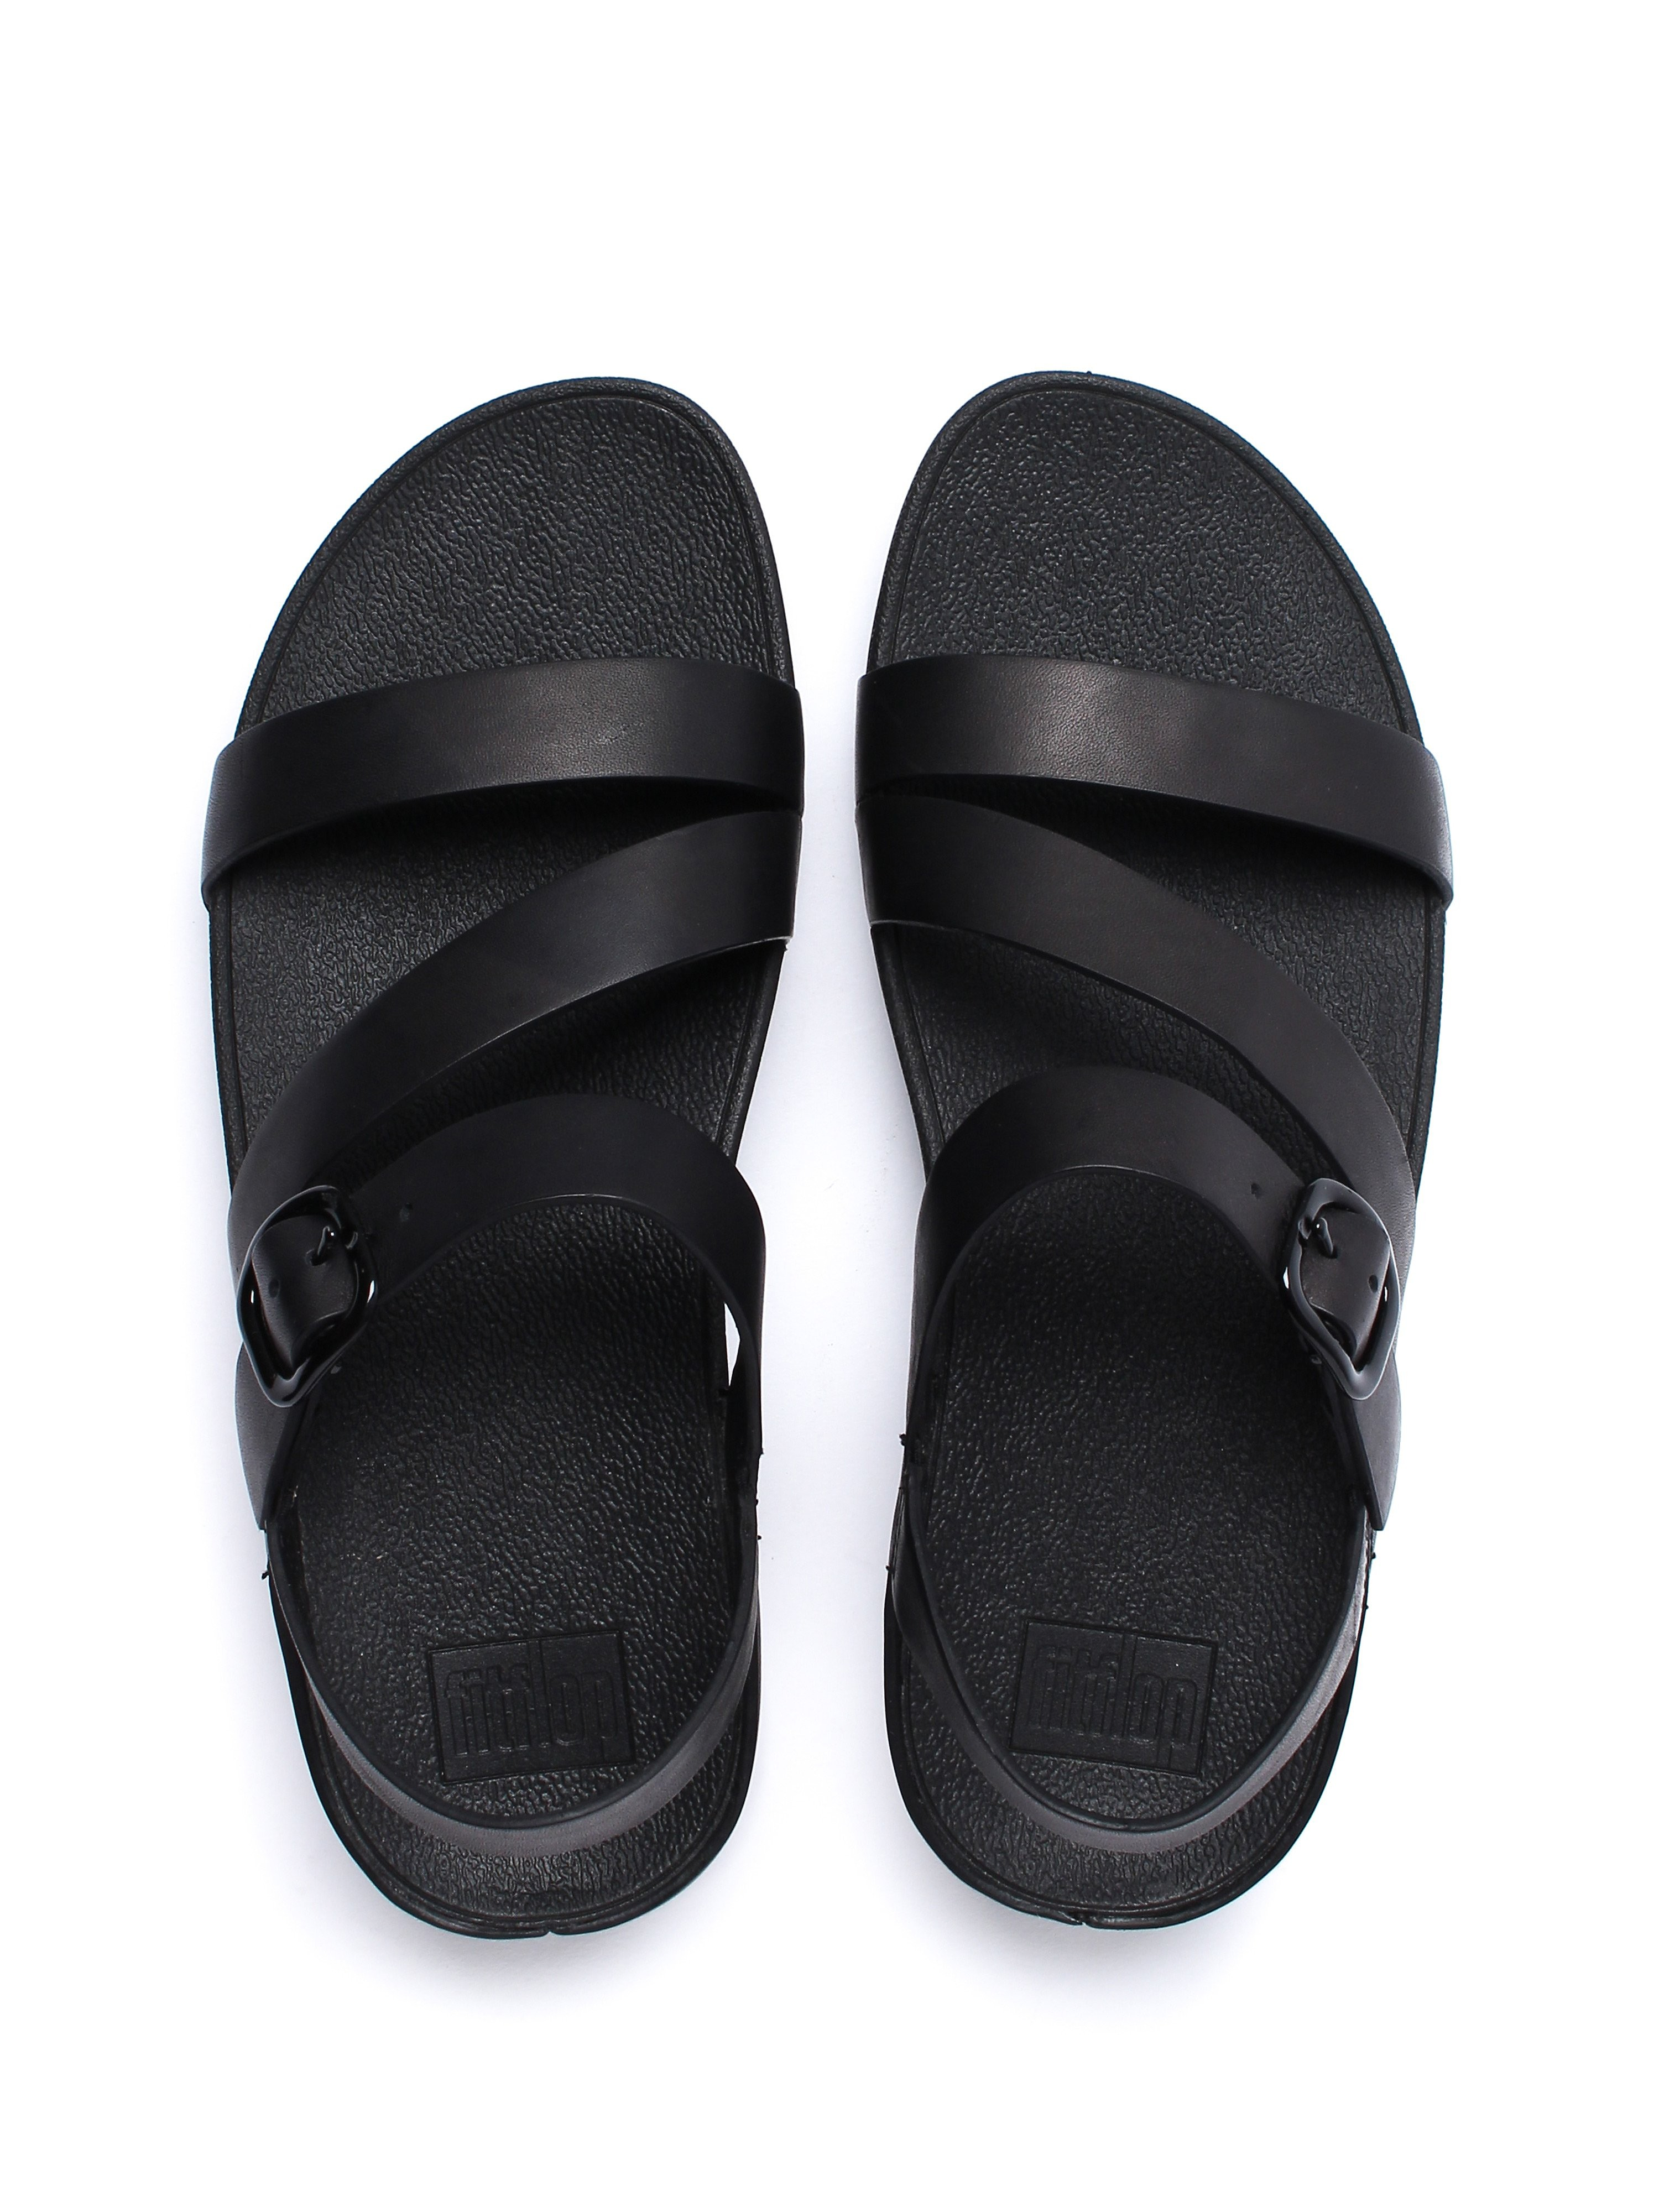 FitFlop Women's The Skinny Z-Cross Sandals - Black Leather